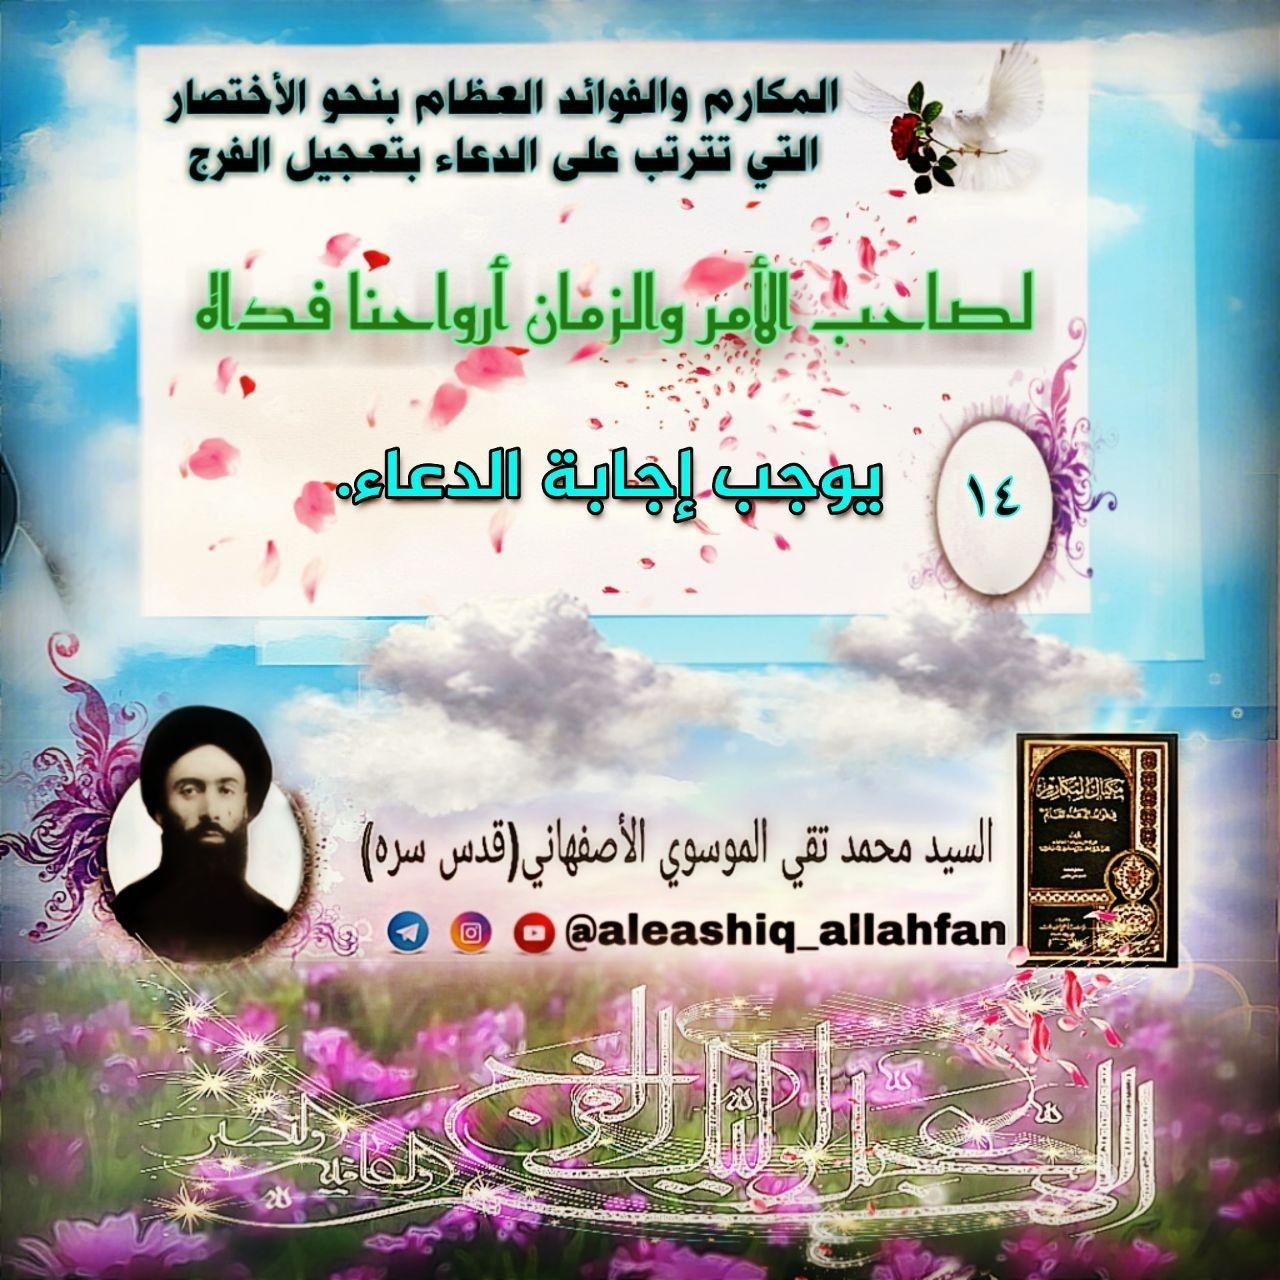 اللهم عجل لوليك الفرج Book Cover Books Poster